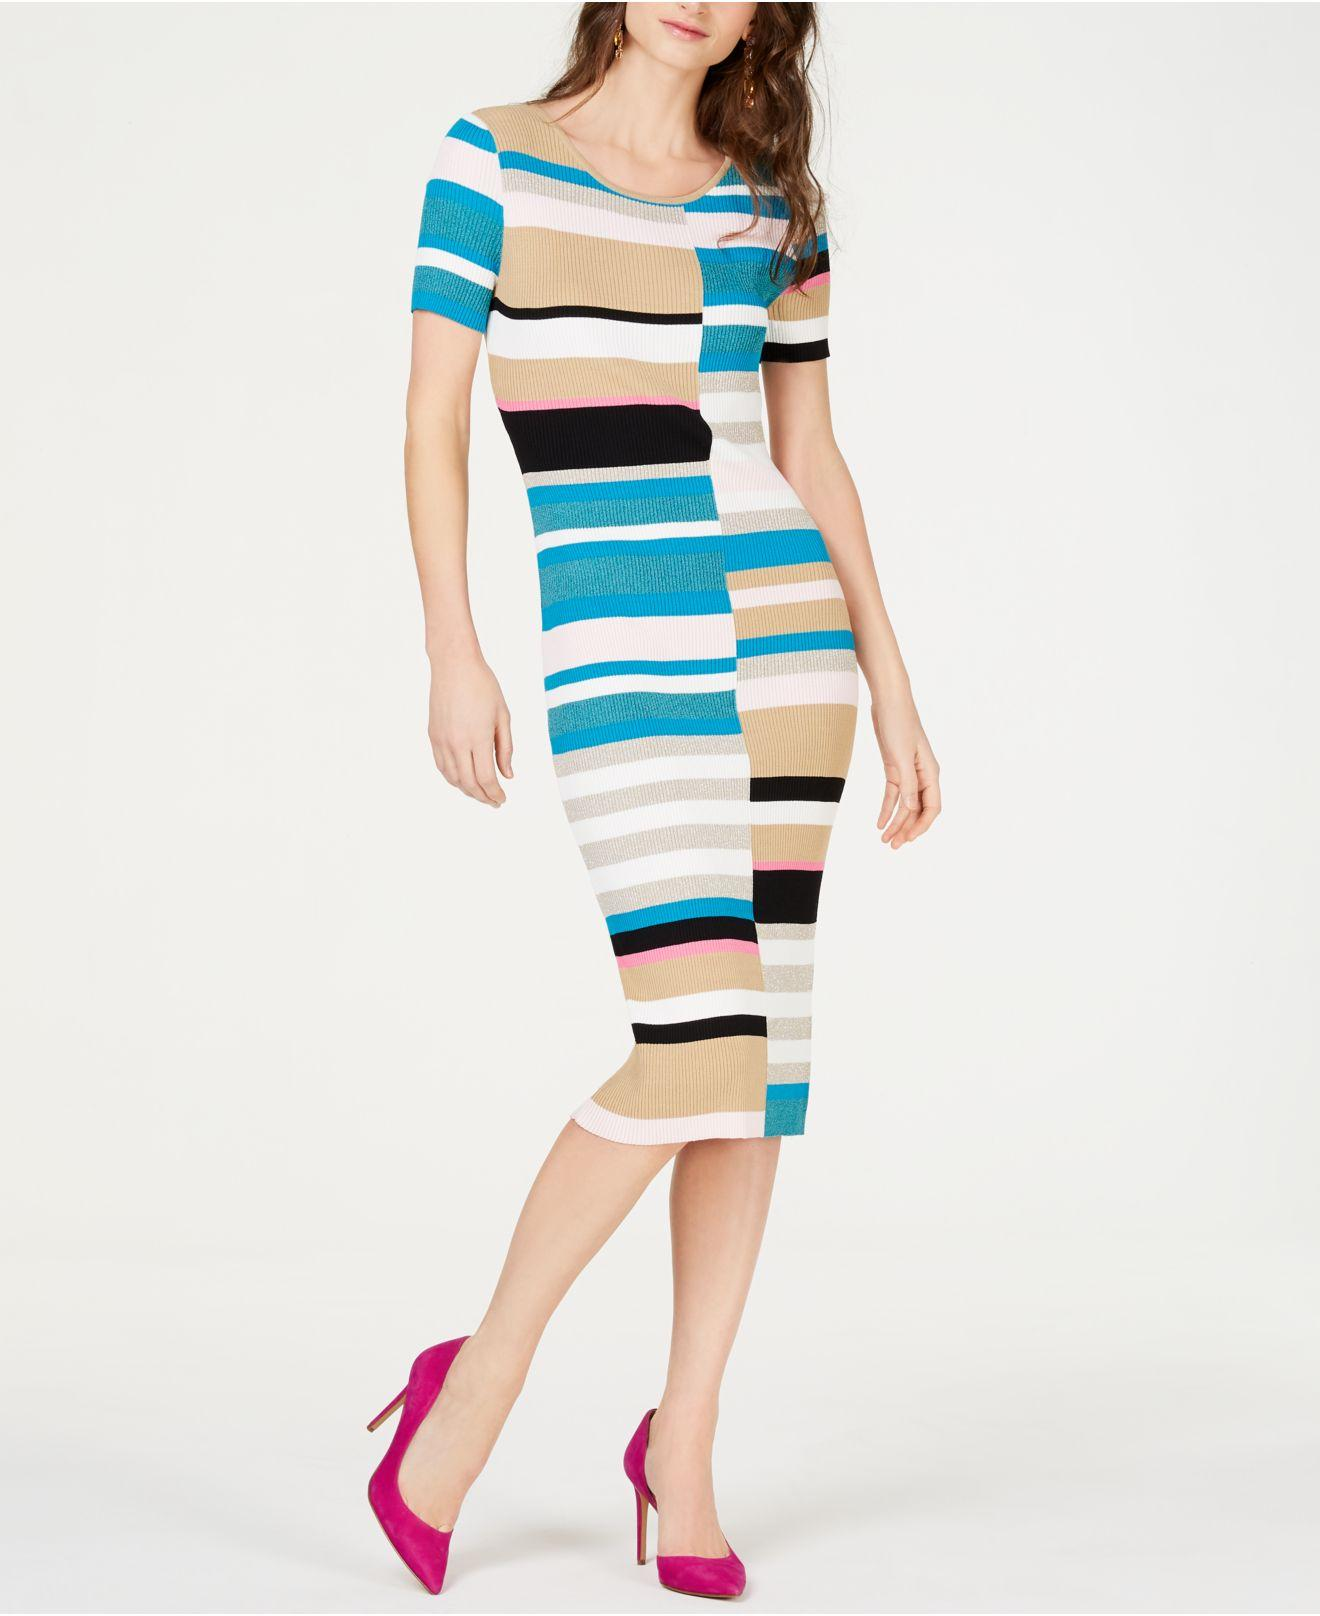 c9a4c0d2ce6 INC International Concepts. Women s Blue I.n.c. Petite Colorblocked  Short-sleeve Sweater Dress ...